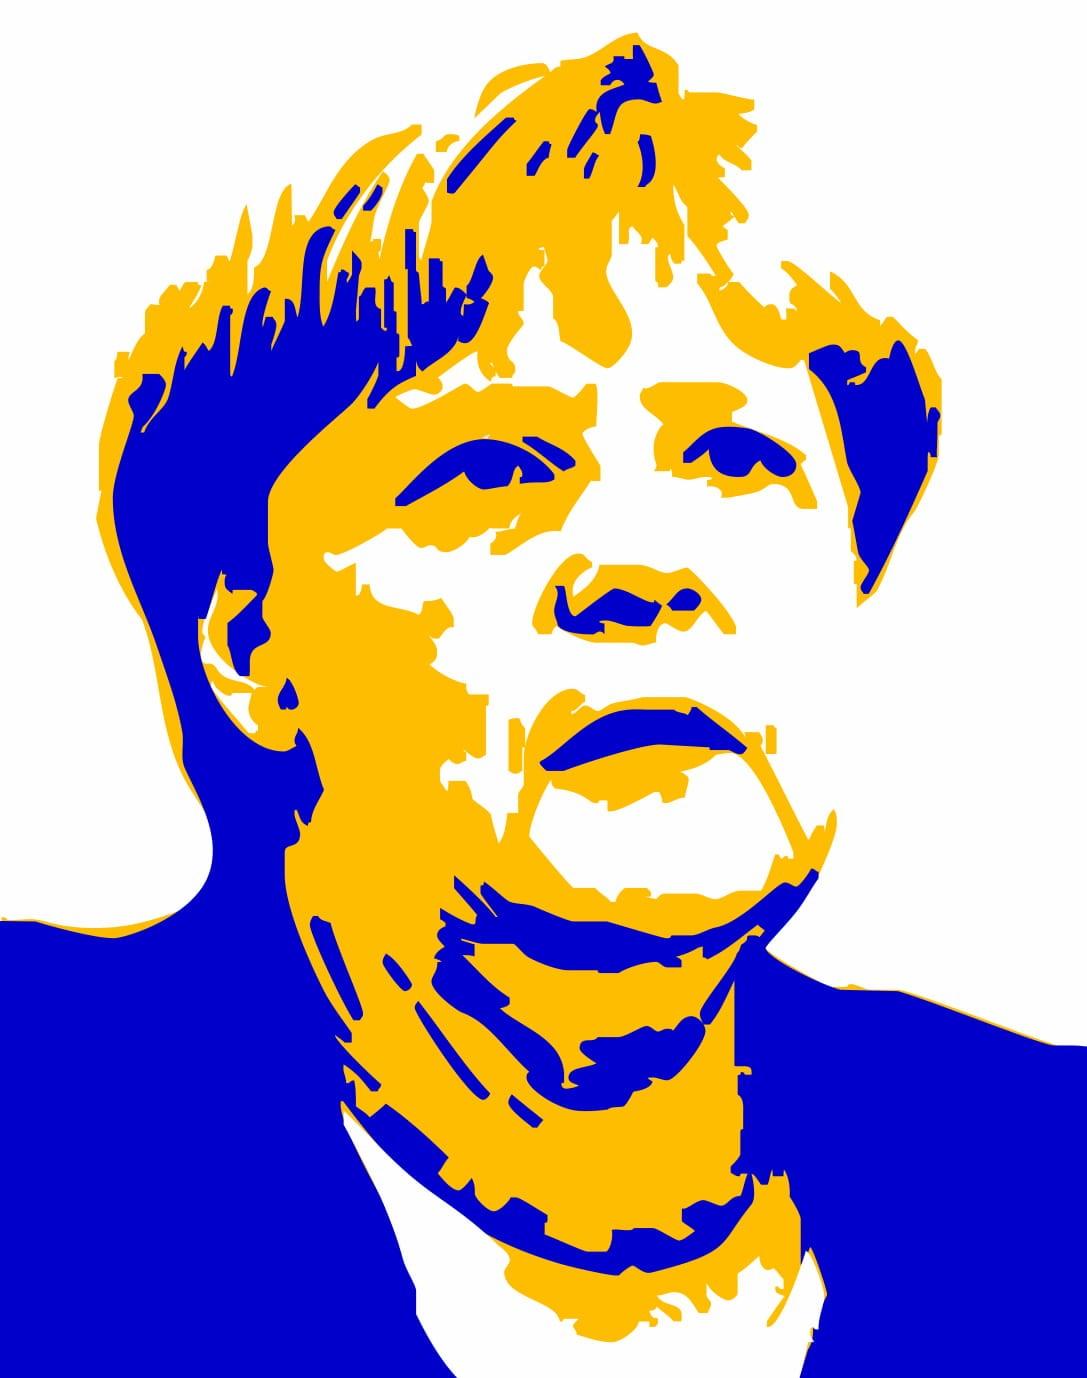 Merkel Europa-1-1